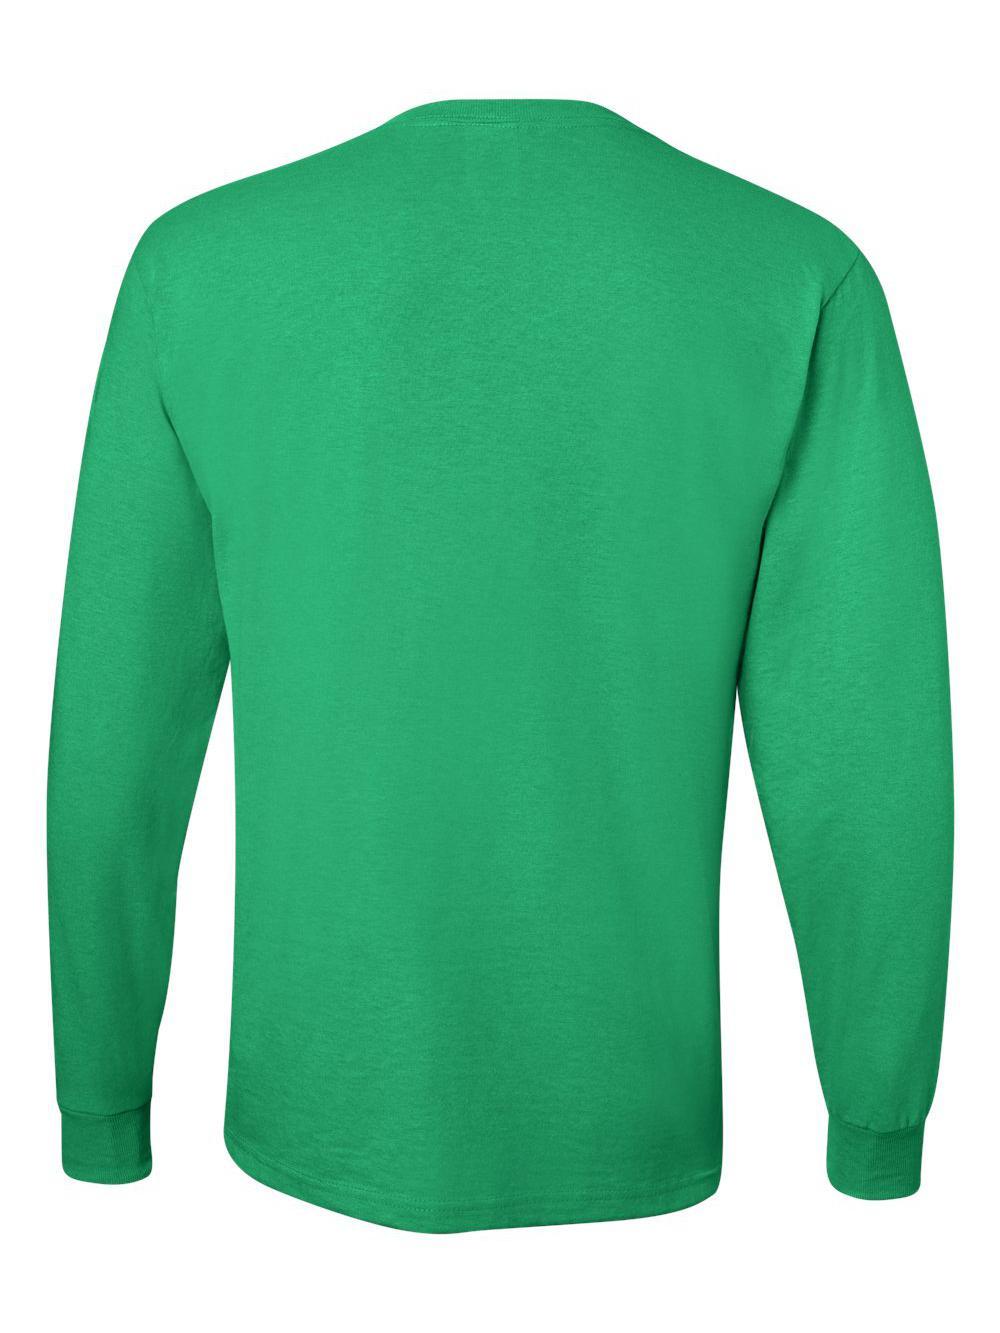 Jerzees-Dri-Power-Long-Sleeve-50-50-T-Shirt-29LSR thumbnail 49